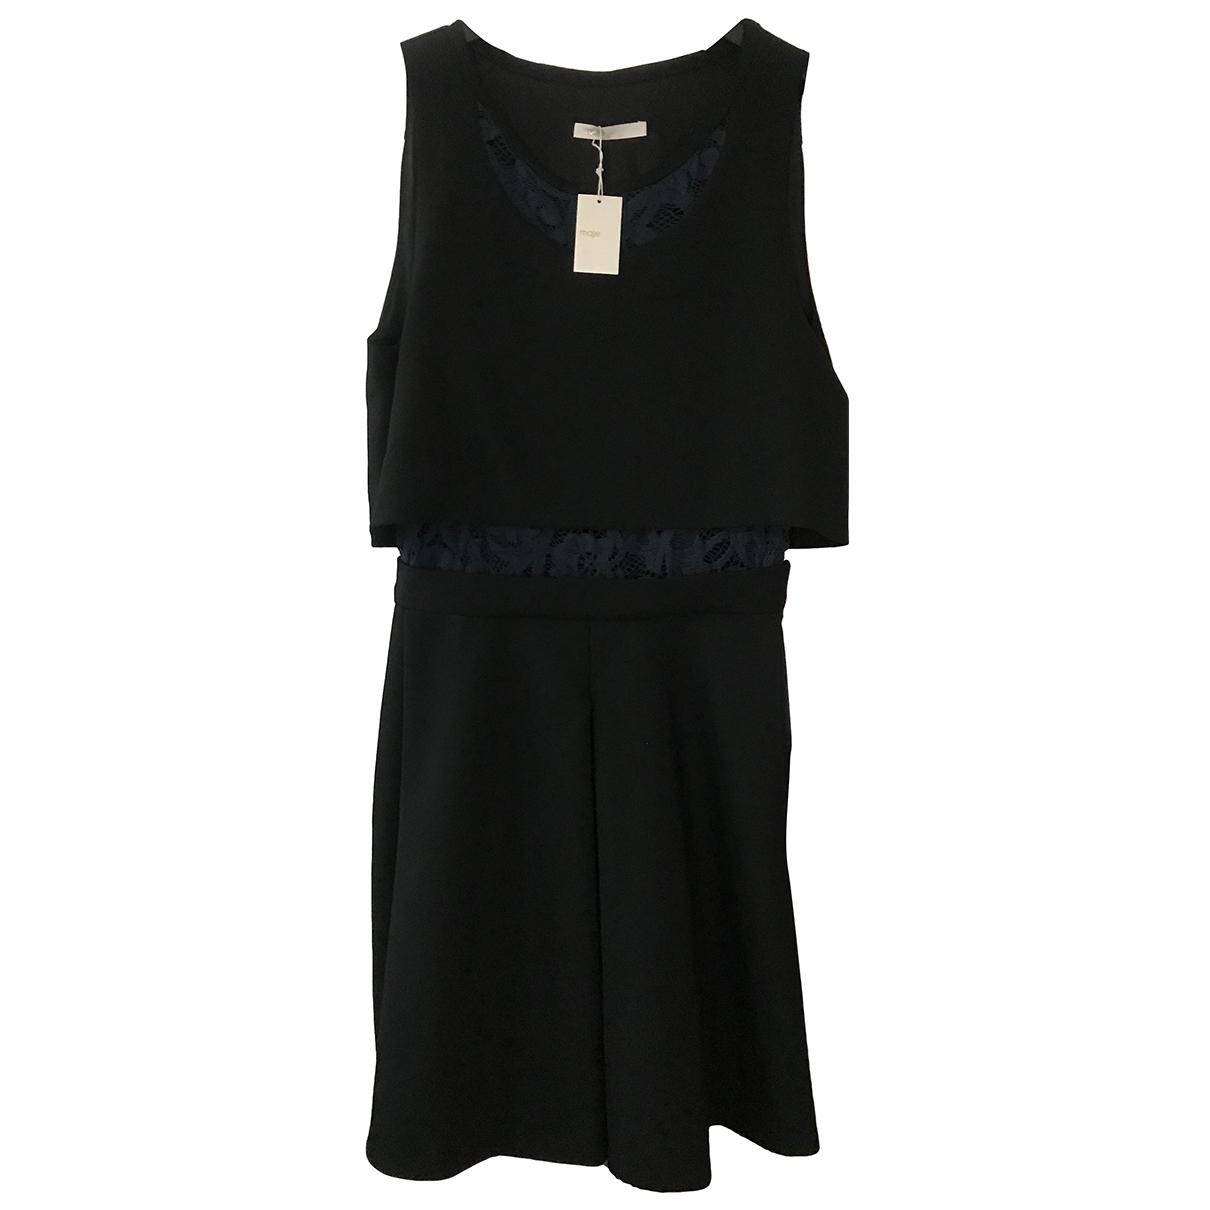 Maje \N Black Lace dress for Women 38 FR